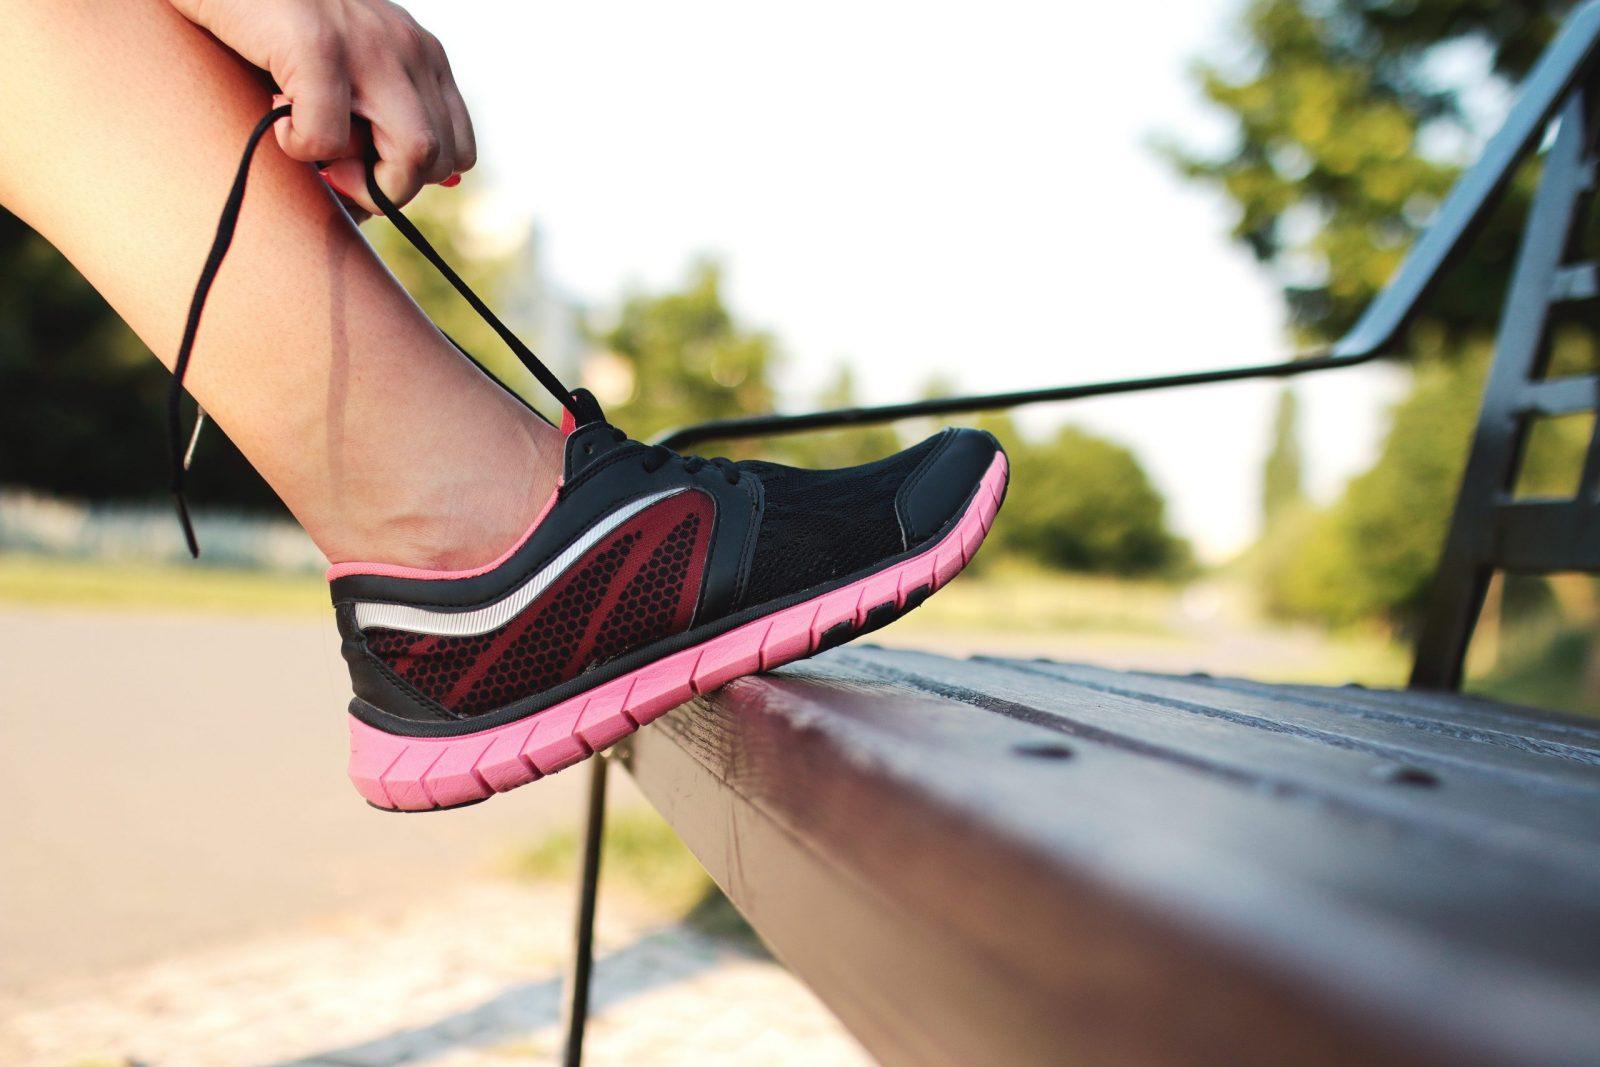 exercise-hobby-jog-jogger-7432